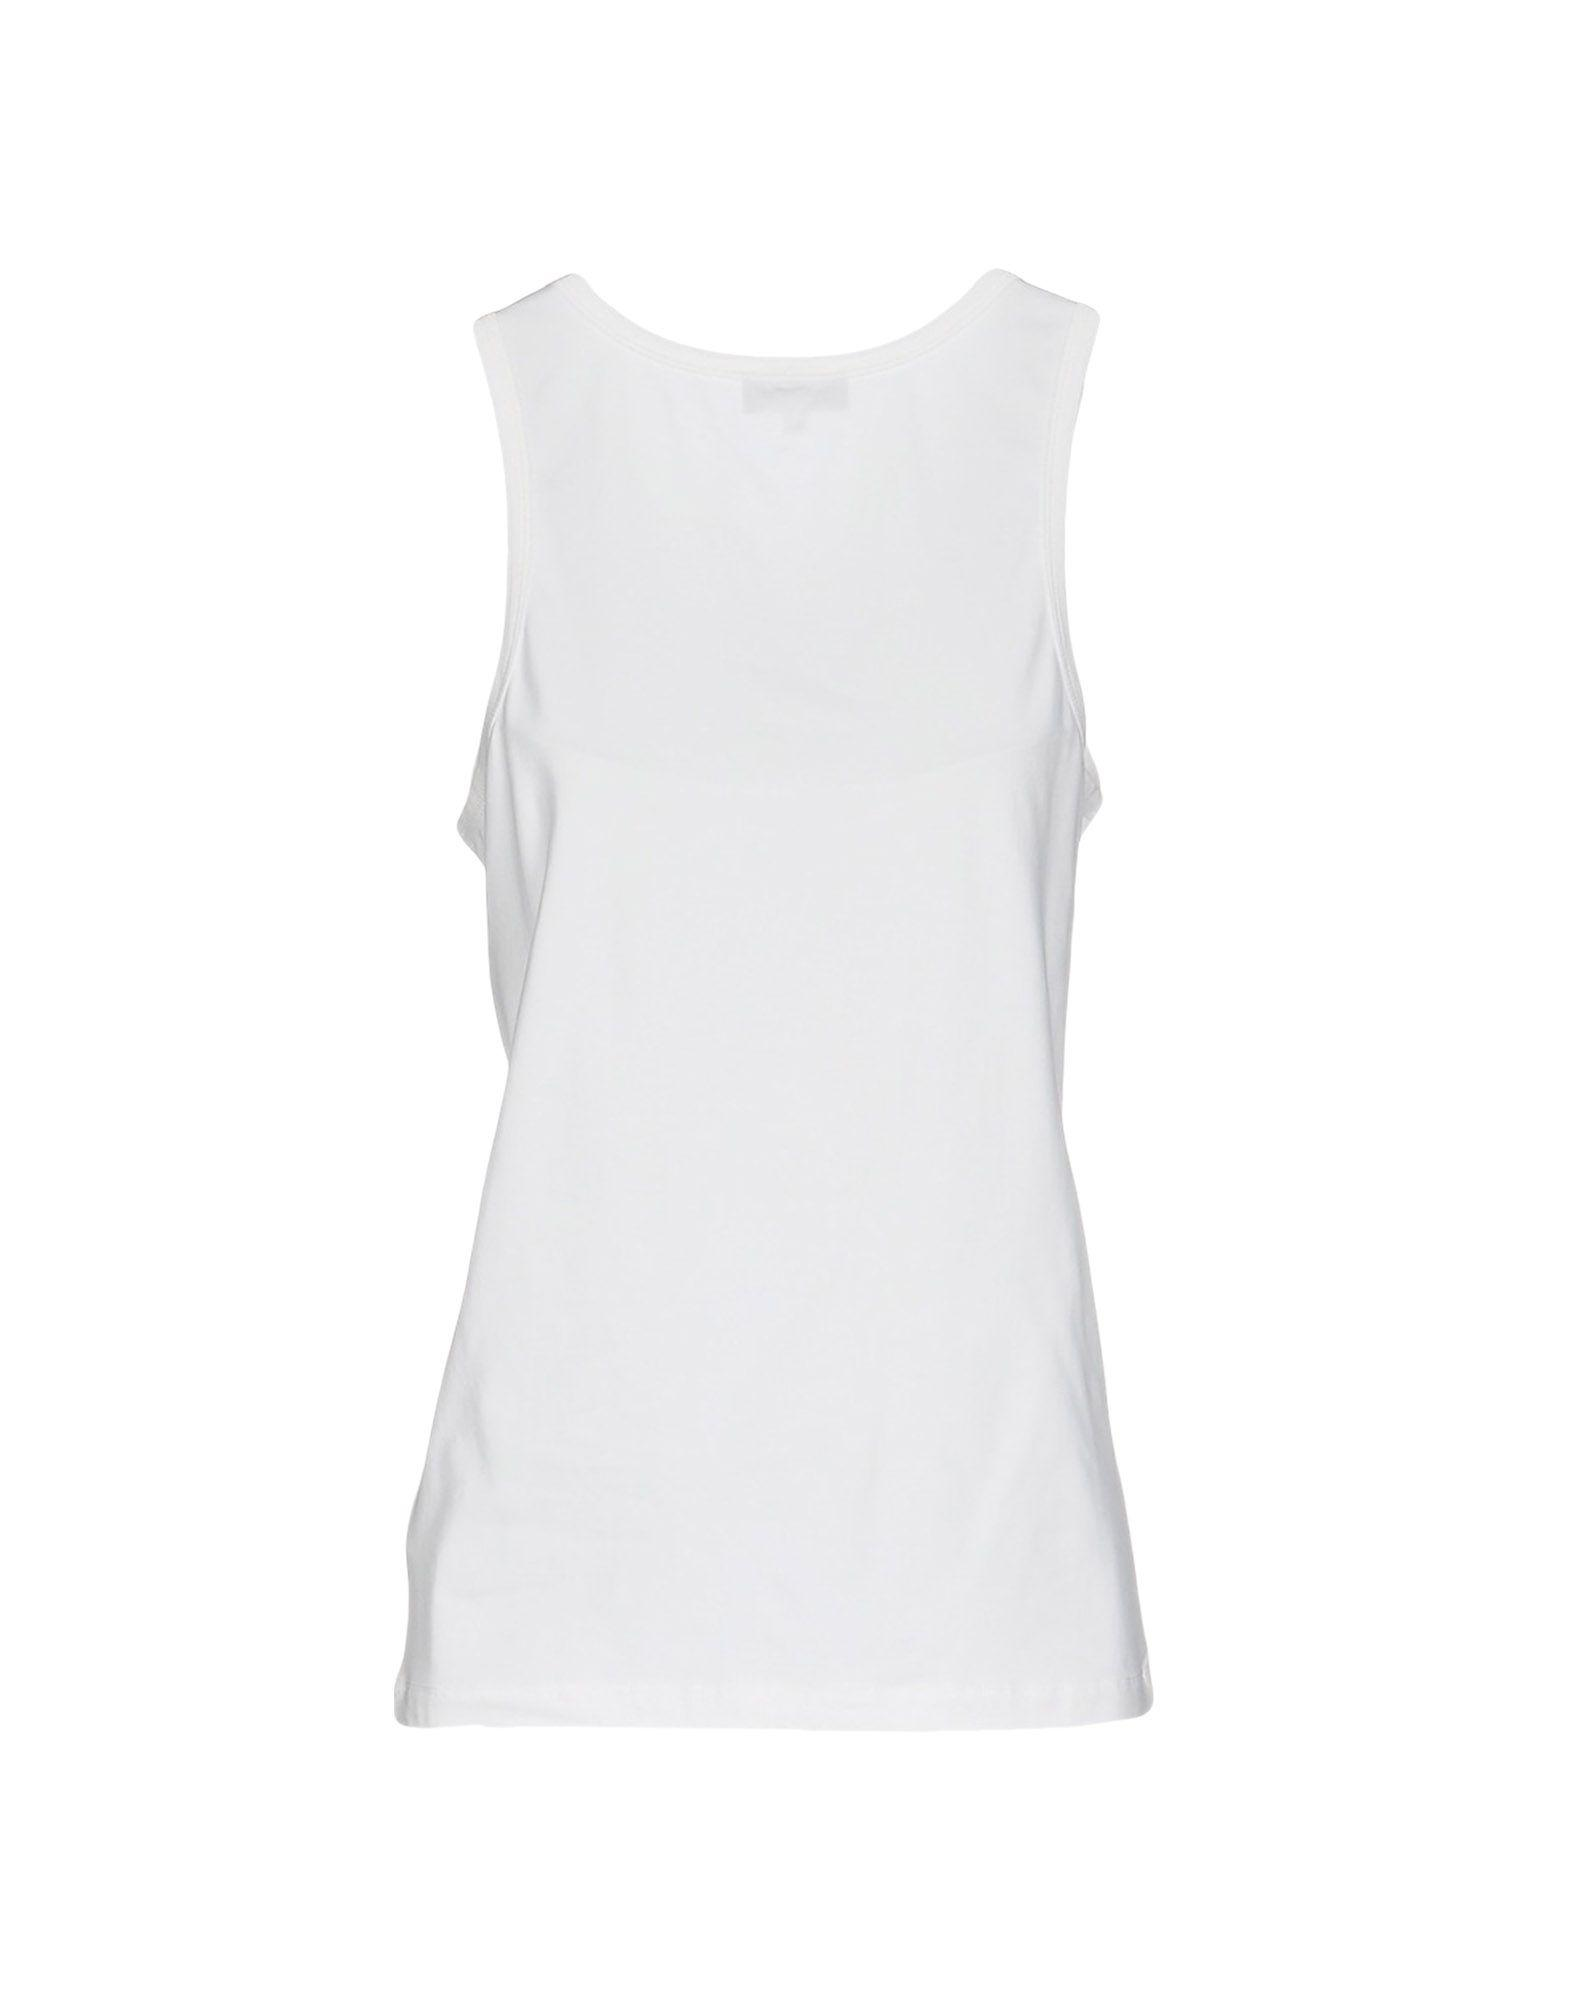 John richmond t shirt in white lyst for Richmond t shirt printing